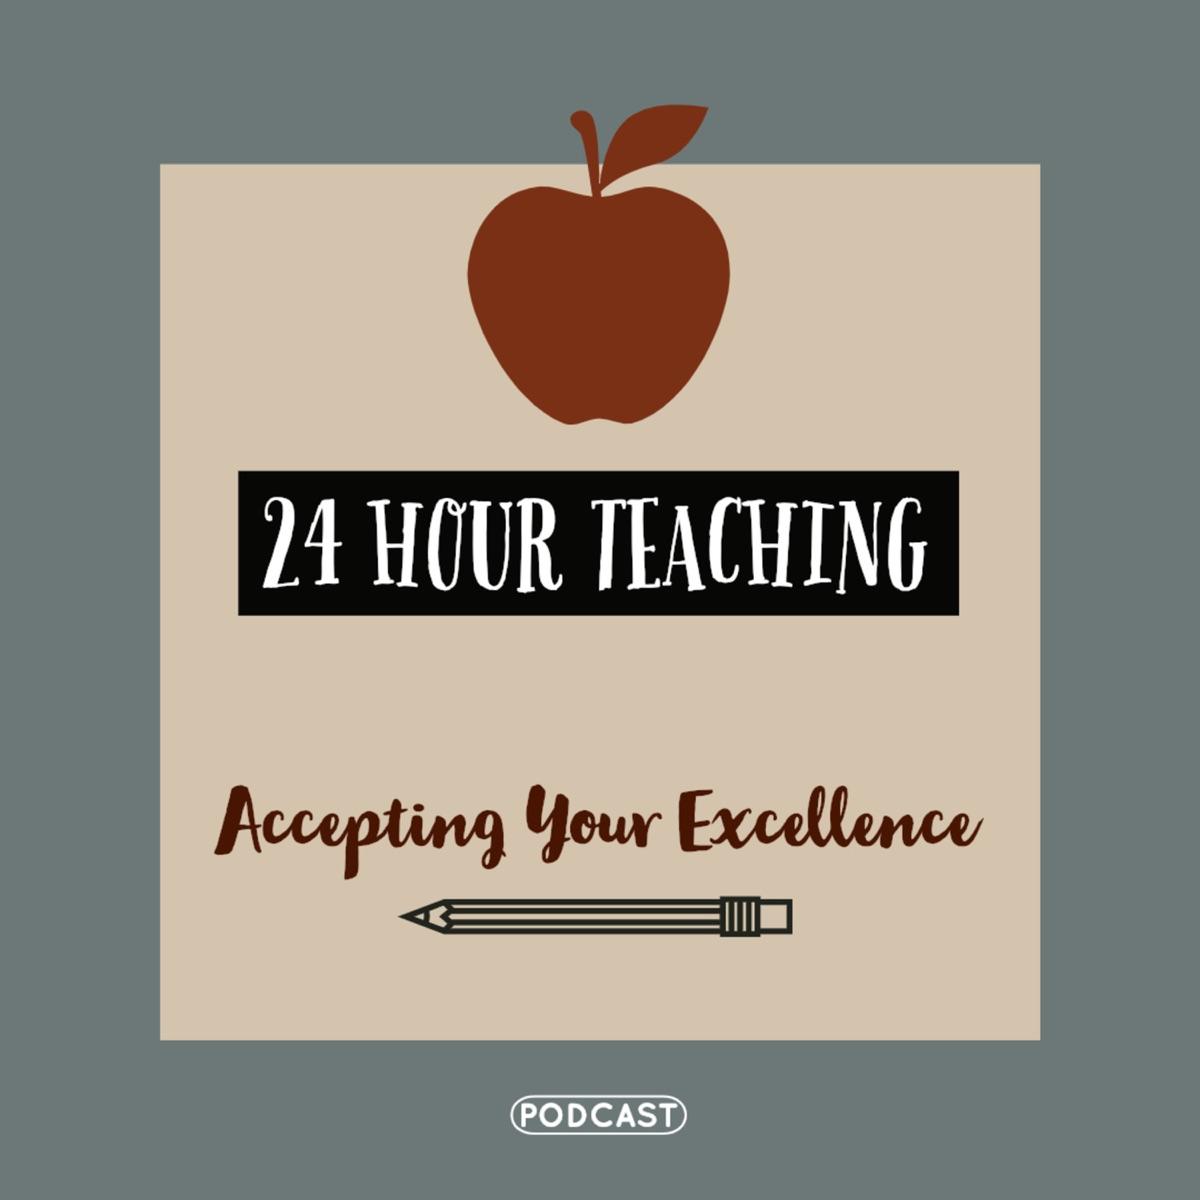 24 Hour Teaching